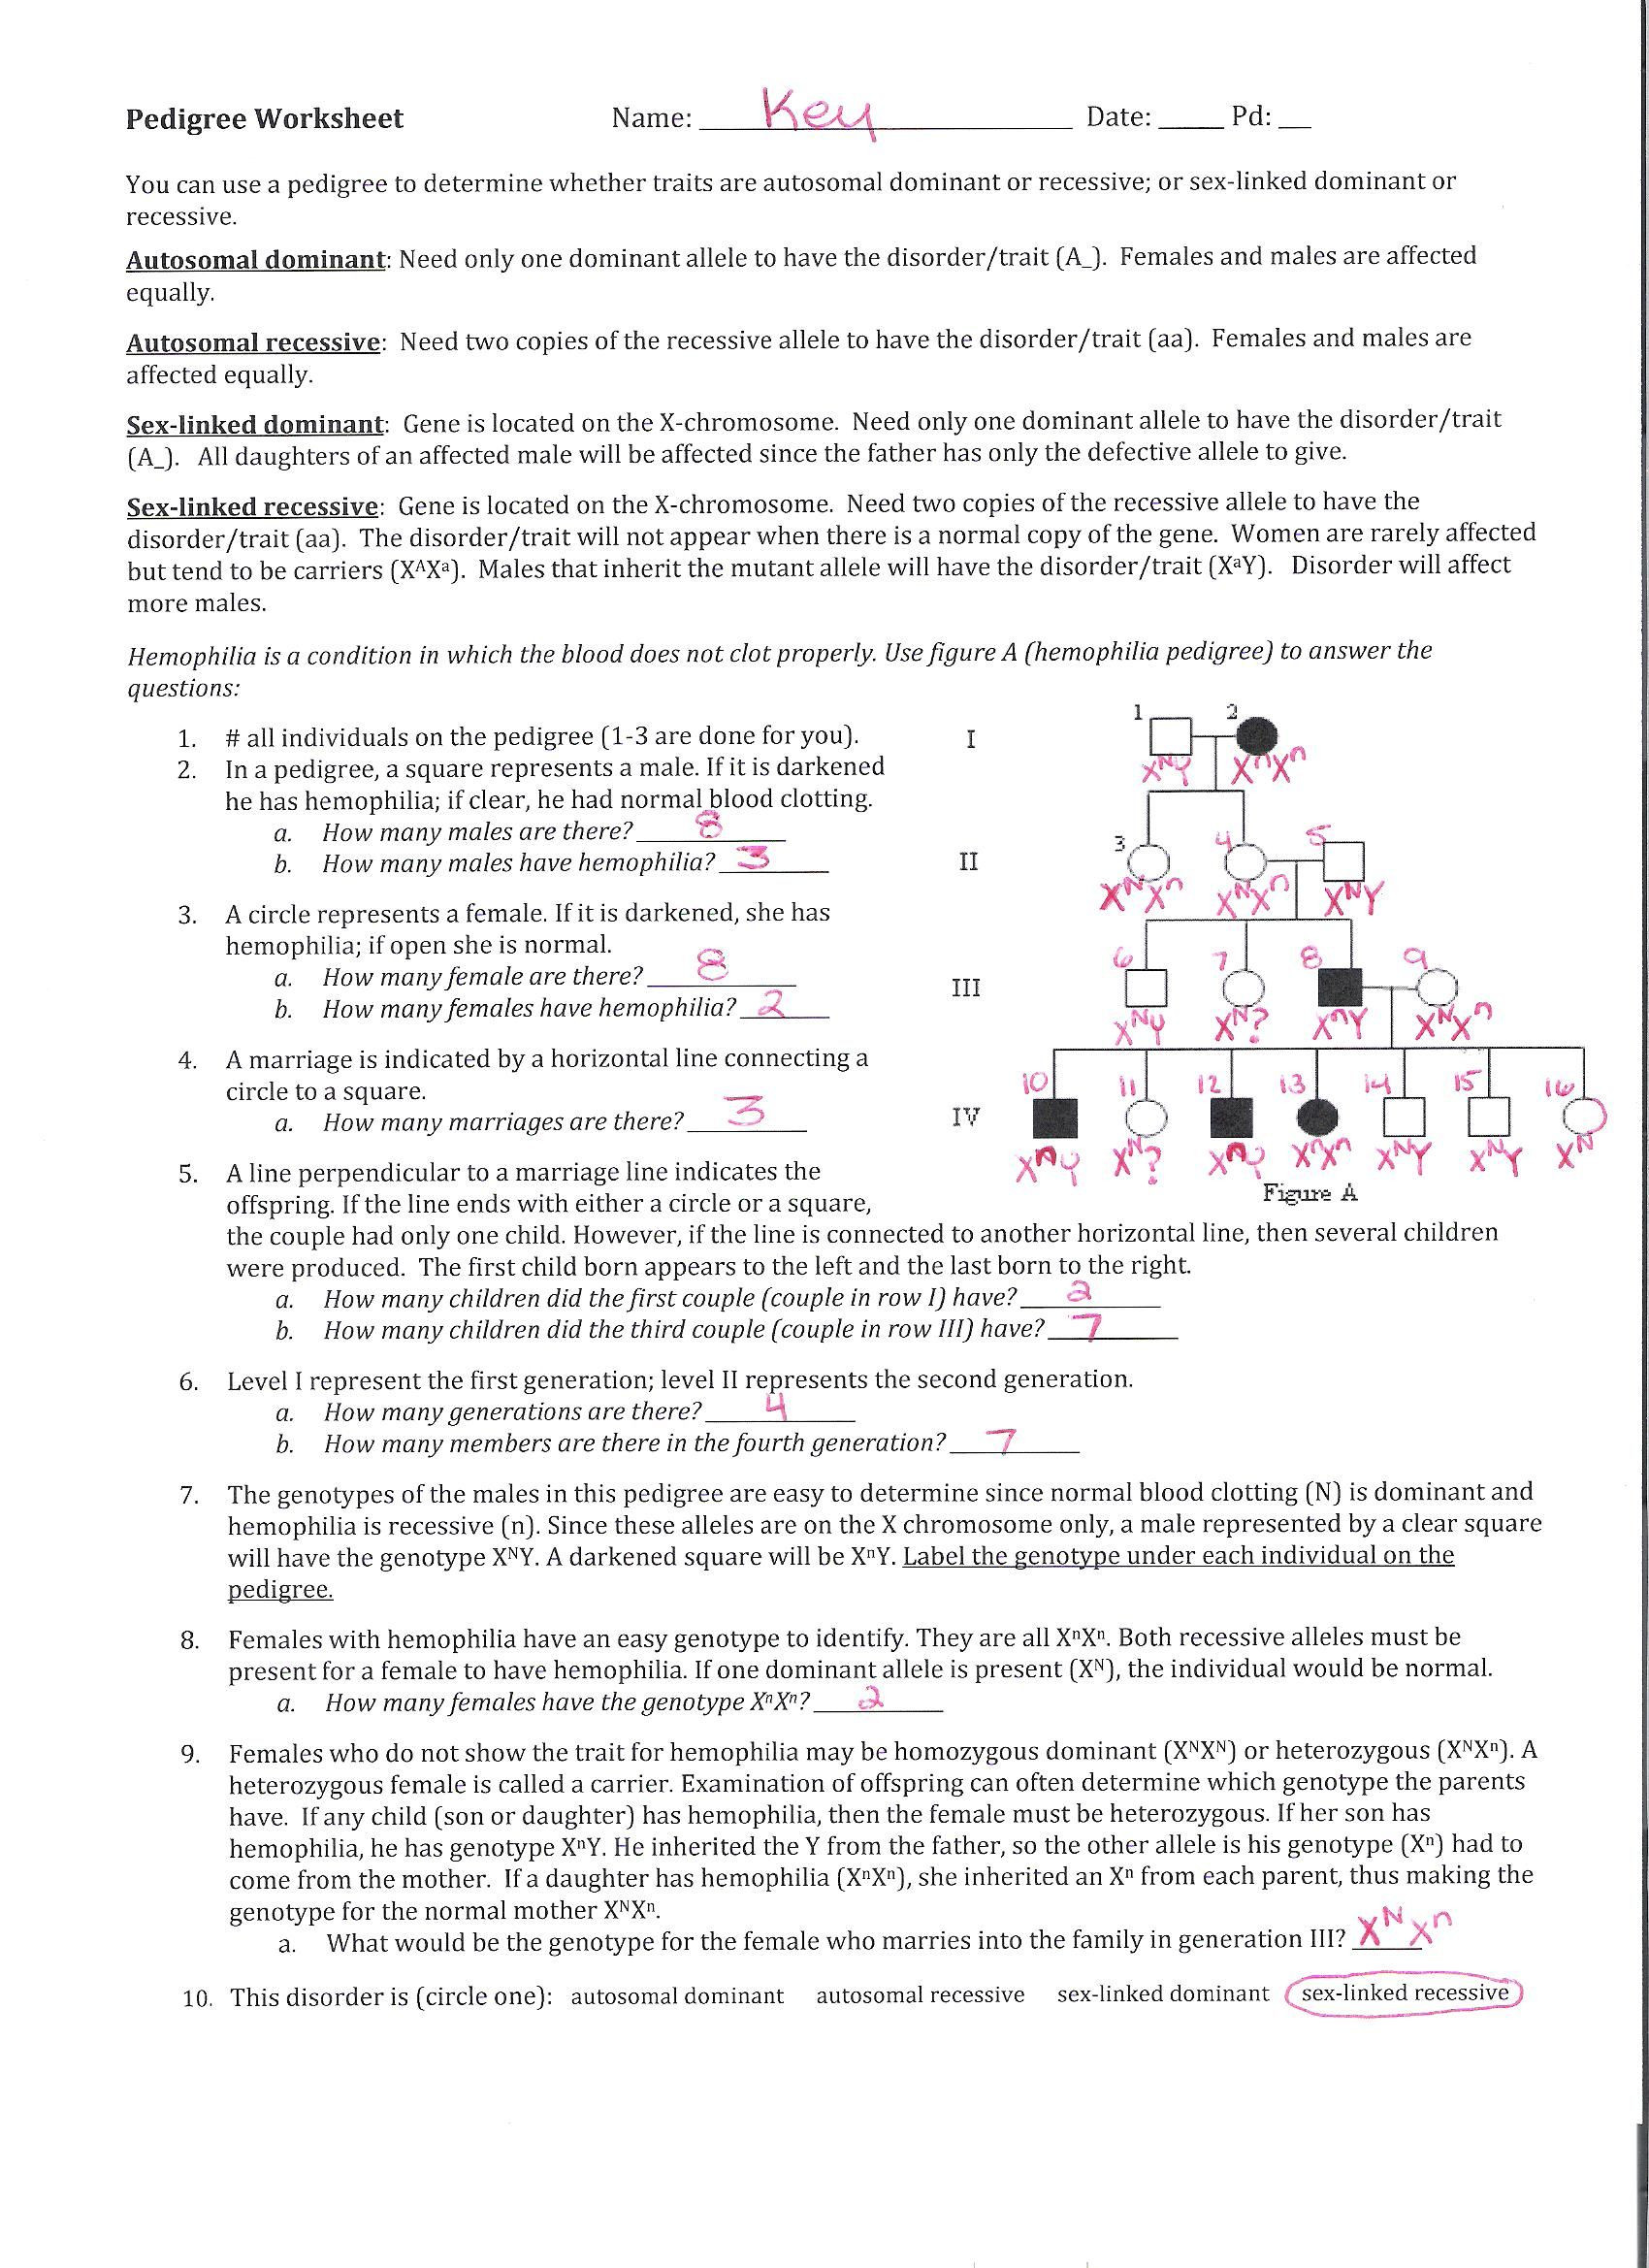 Genetics Pedigree Worksheet Answers